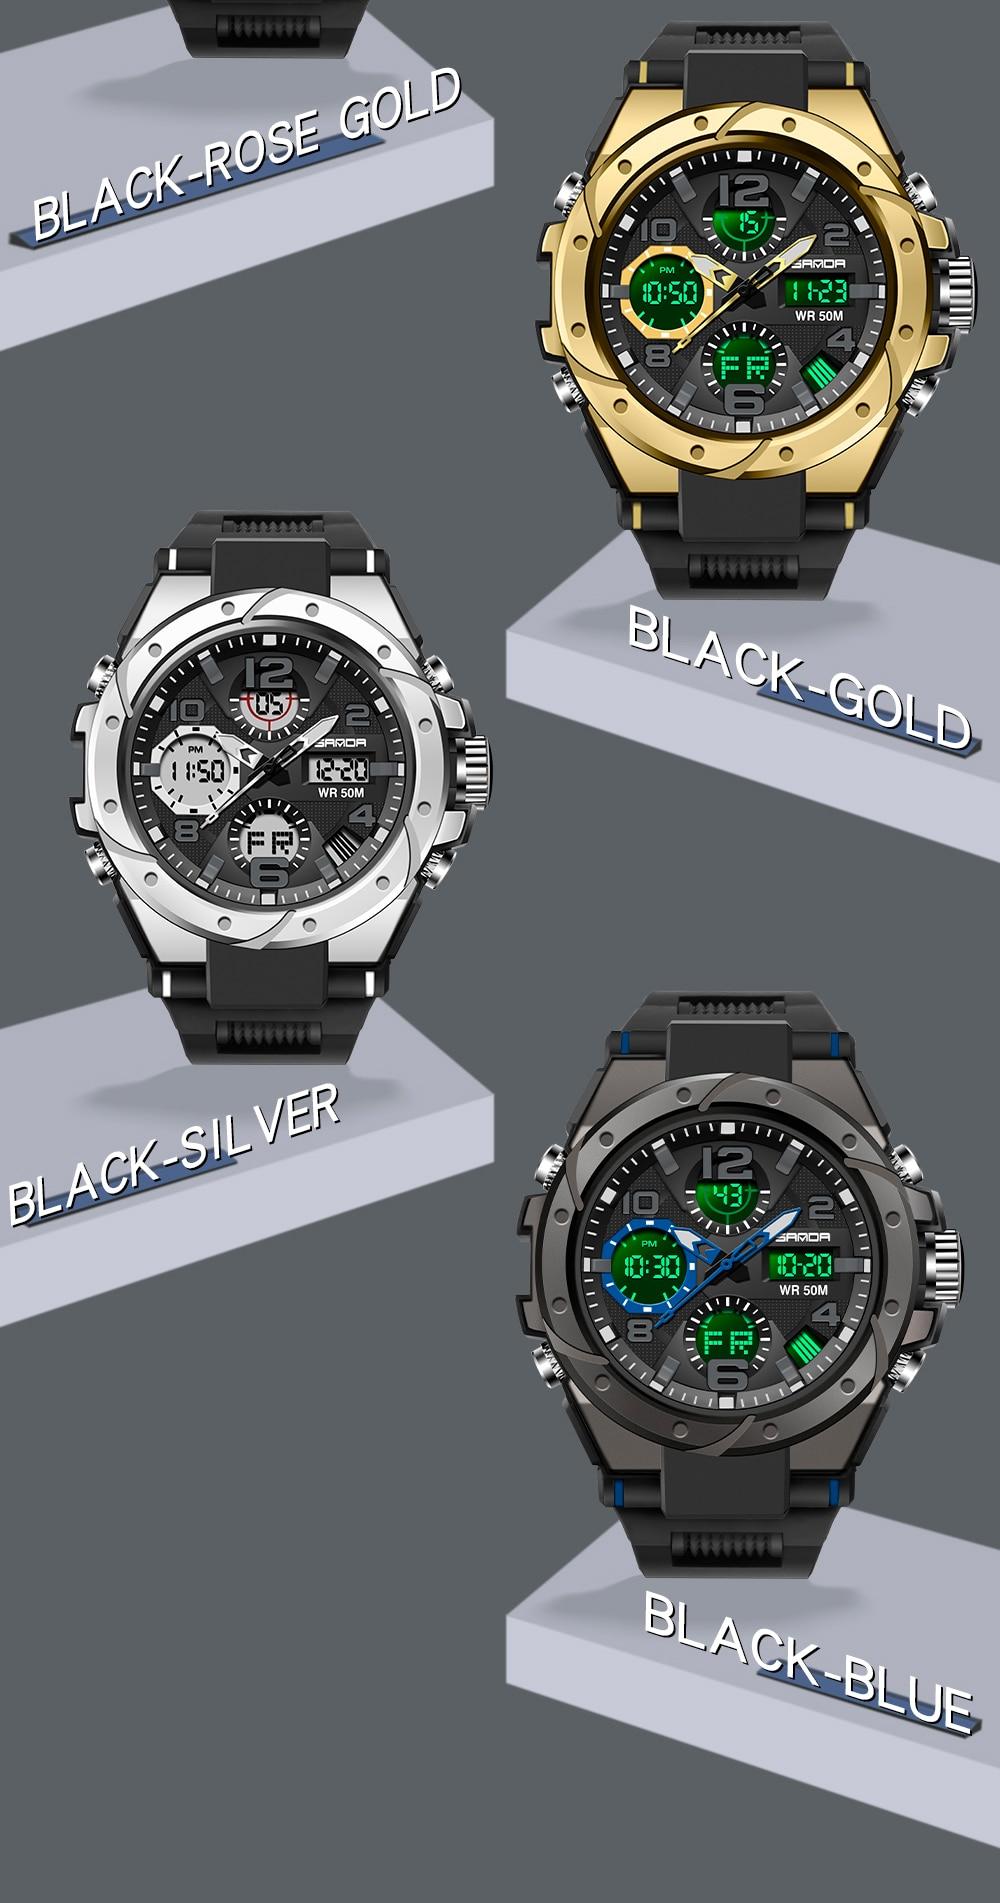 H6b36931eda034e2ab7186194702f1cbek SANAD Top Brand Luxury Men's Military Sports Watches 5ATM Waterproof